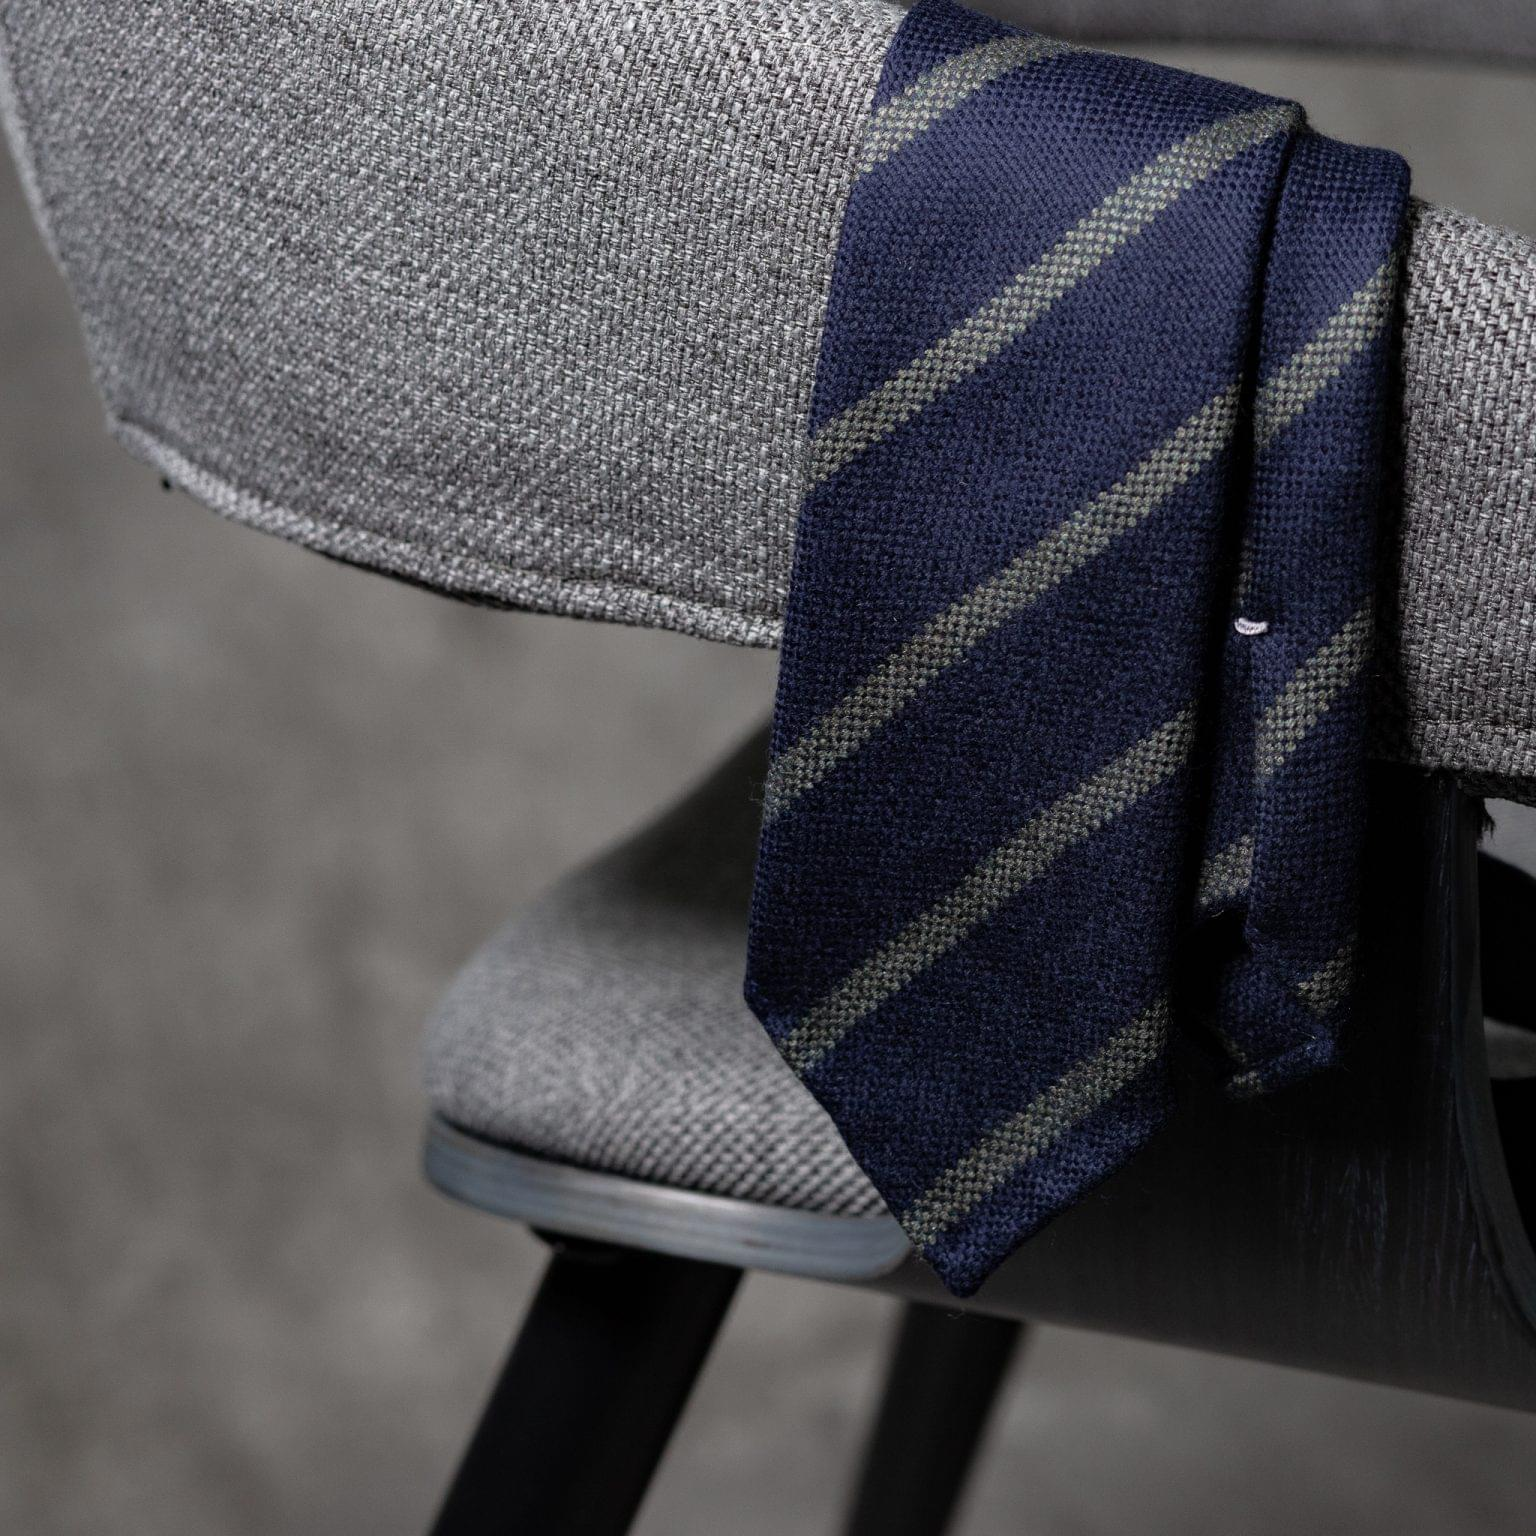 WOOL-LANA-0518-Tie-Initials-Corbata-Iniciales-The-Seelk-2